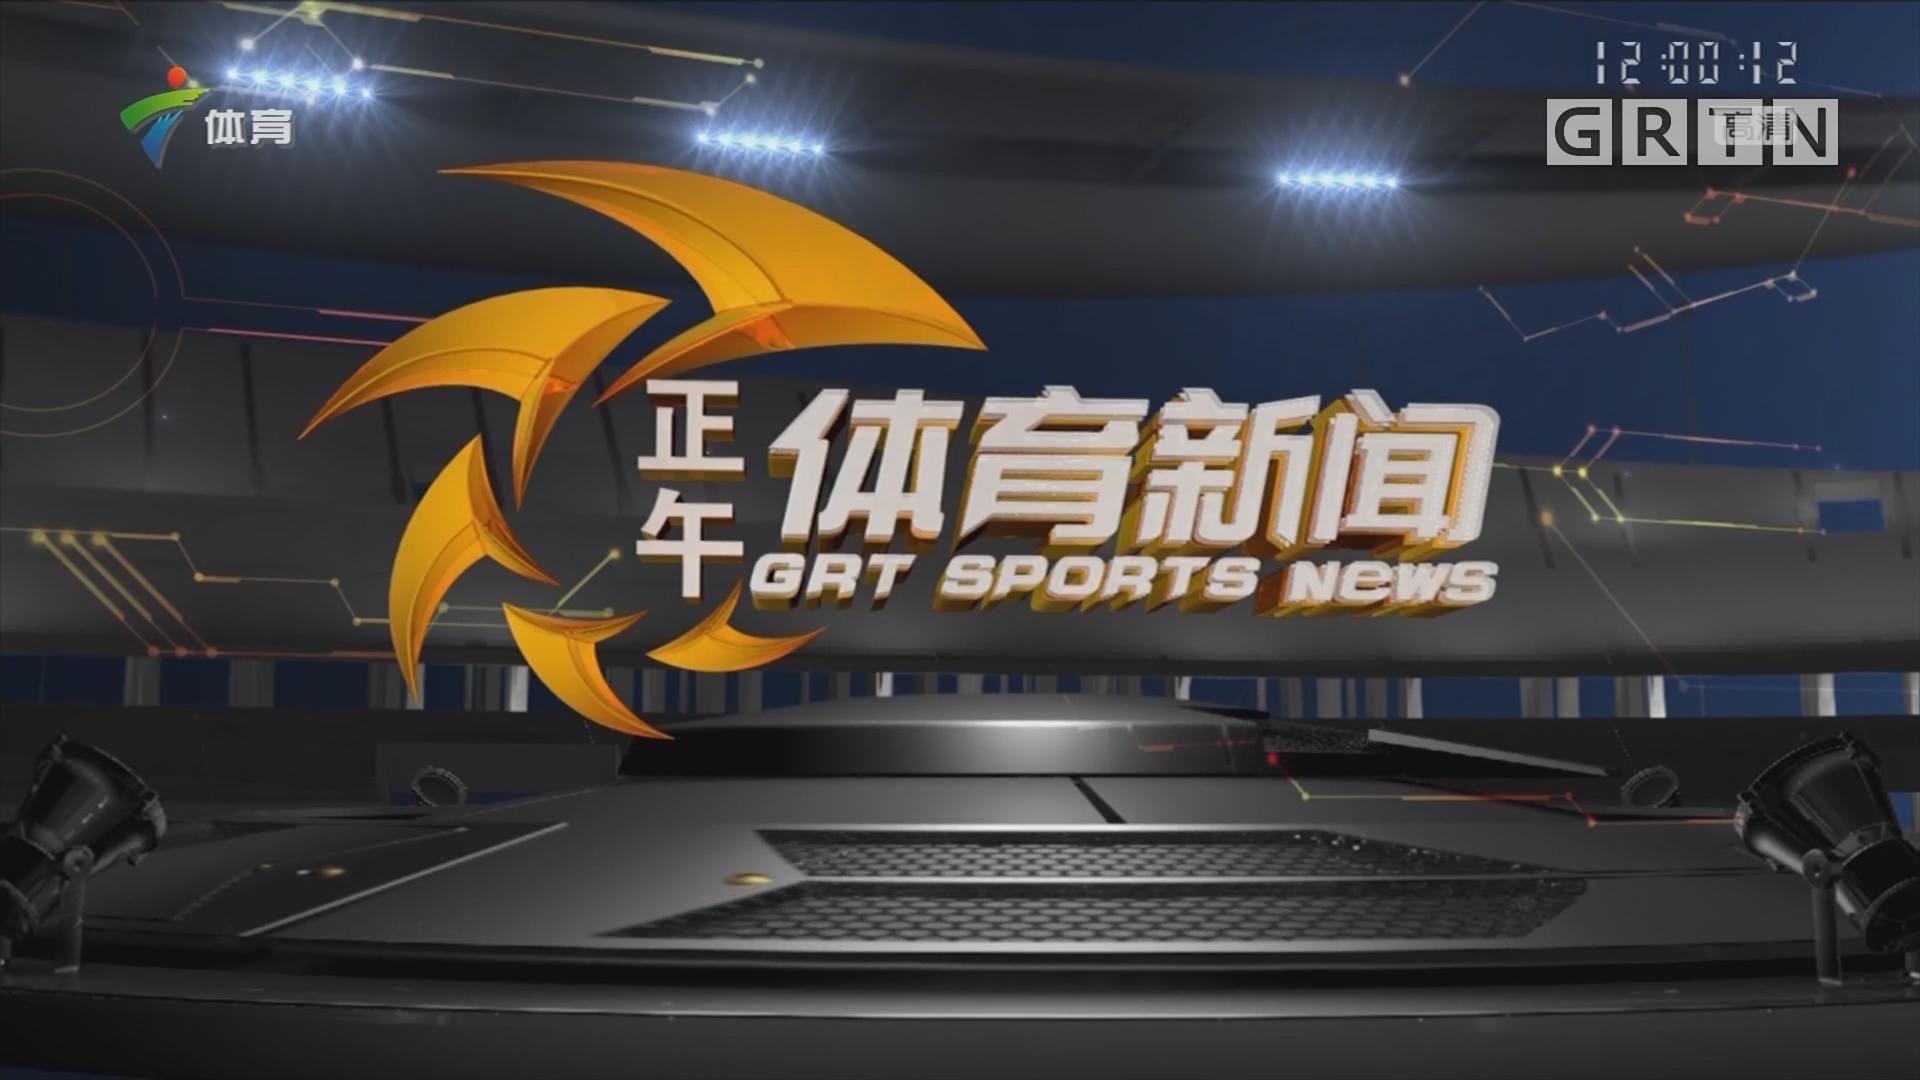 [HD][2019-01-08]正午体育新闻:笑纳乌龙 中国队逆转战胜吉尔吉斯斯坦